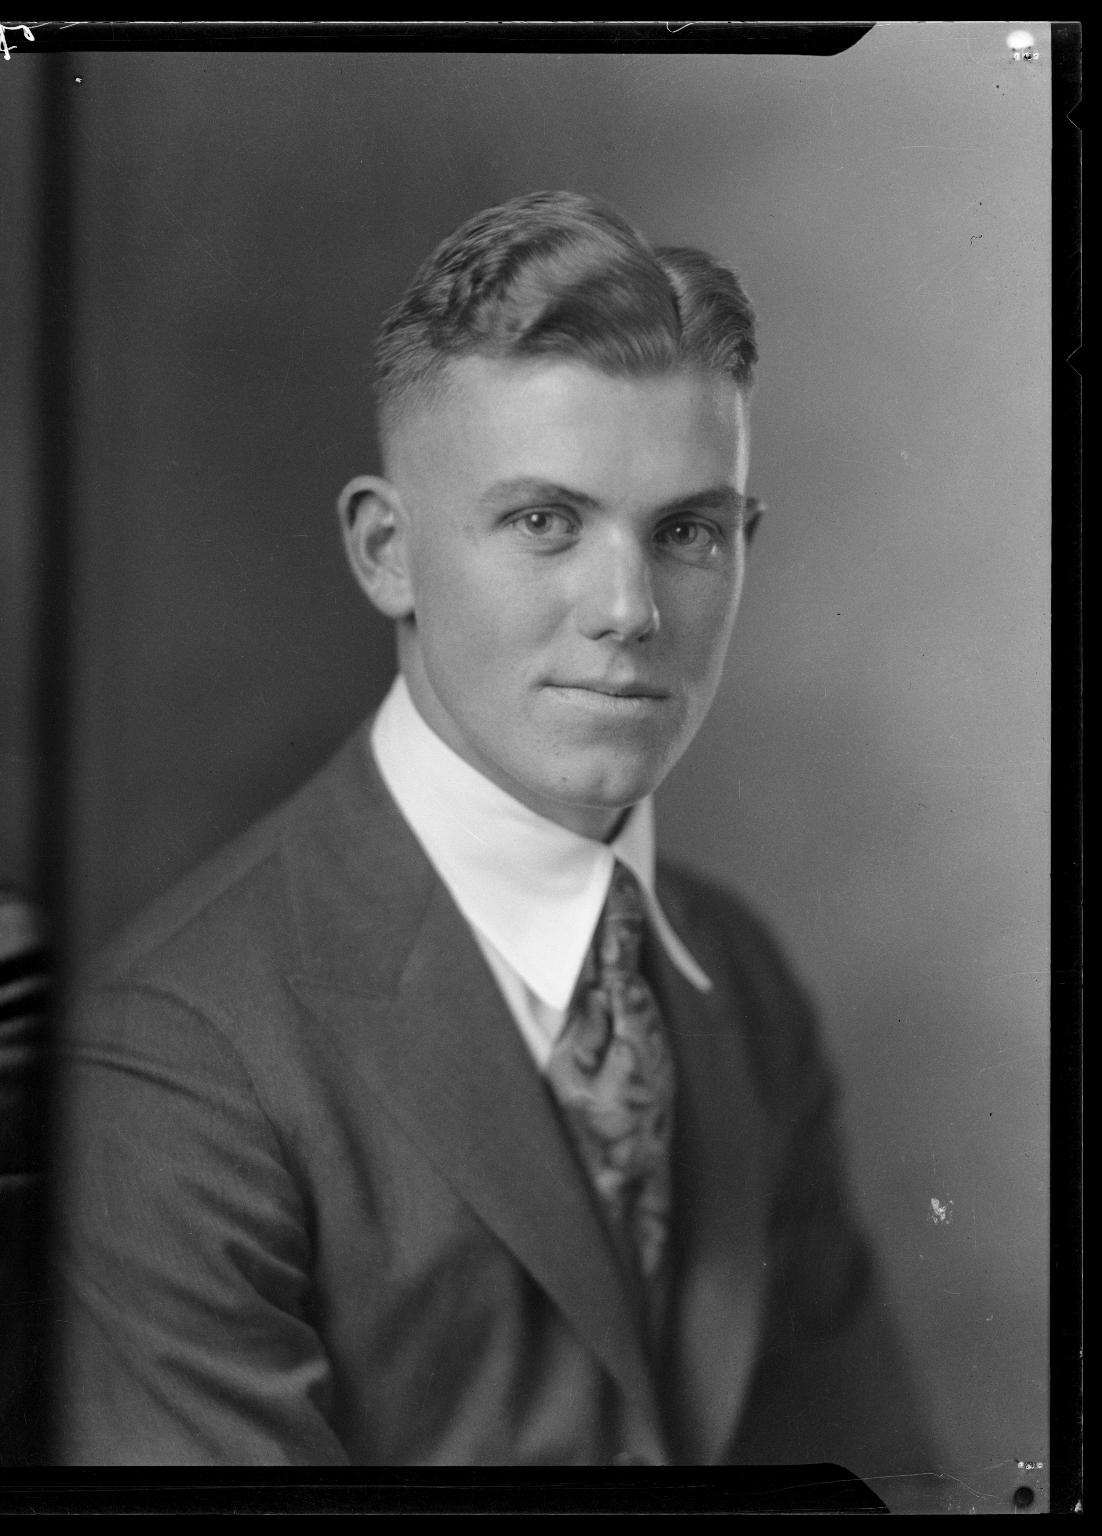 Portraits of Warren Thompson